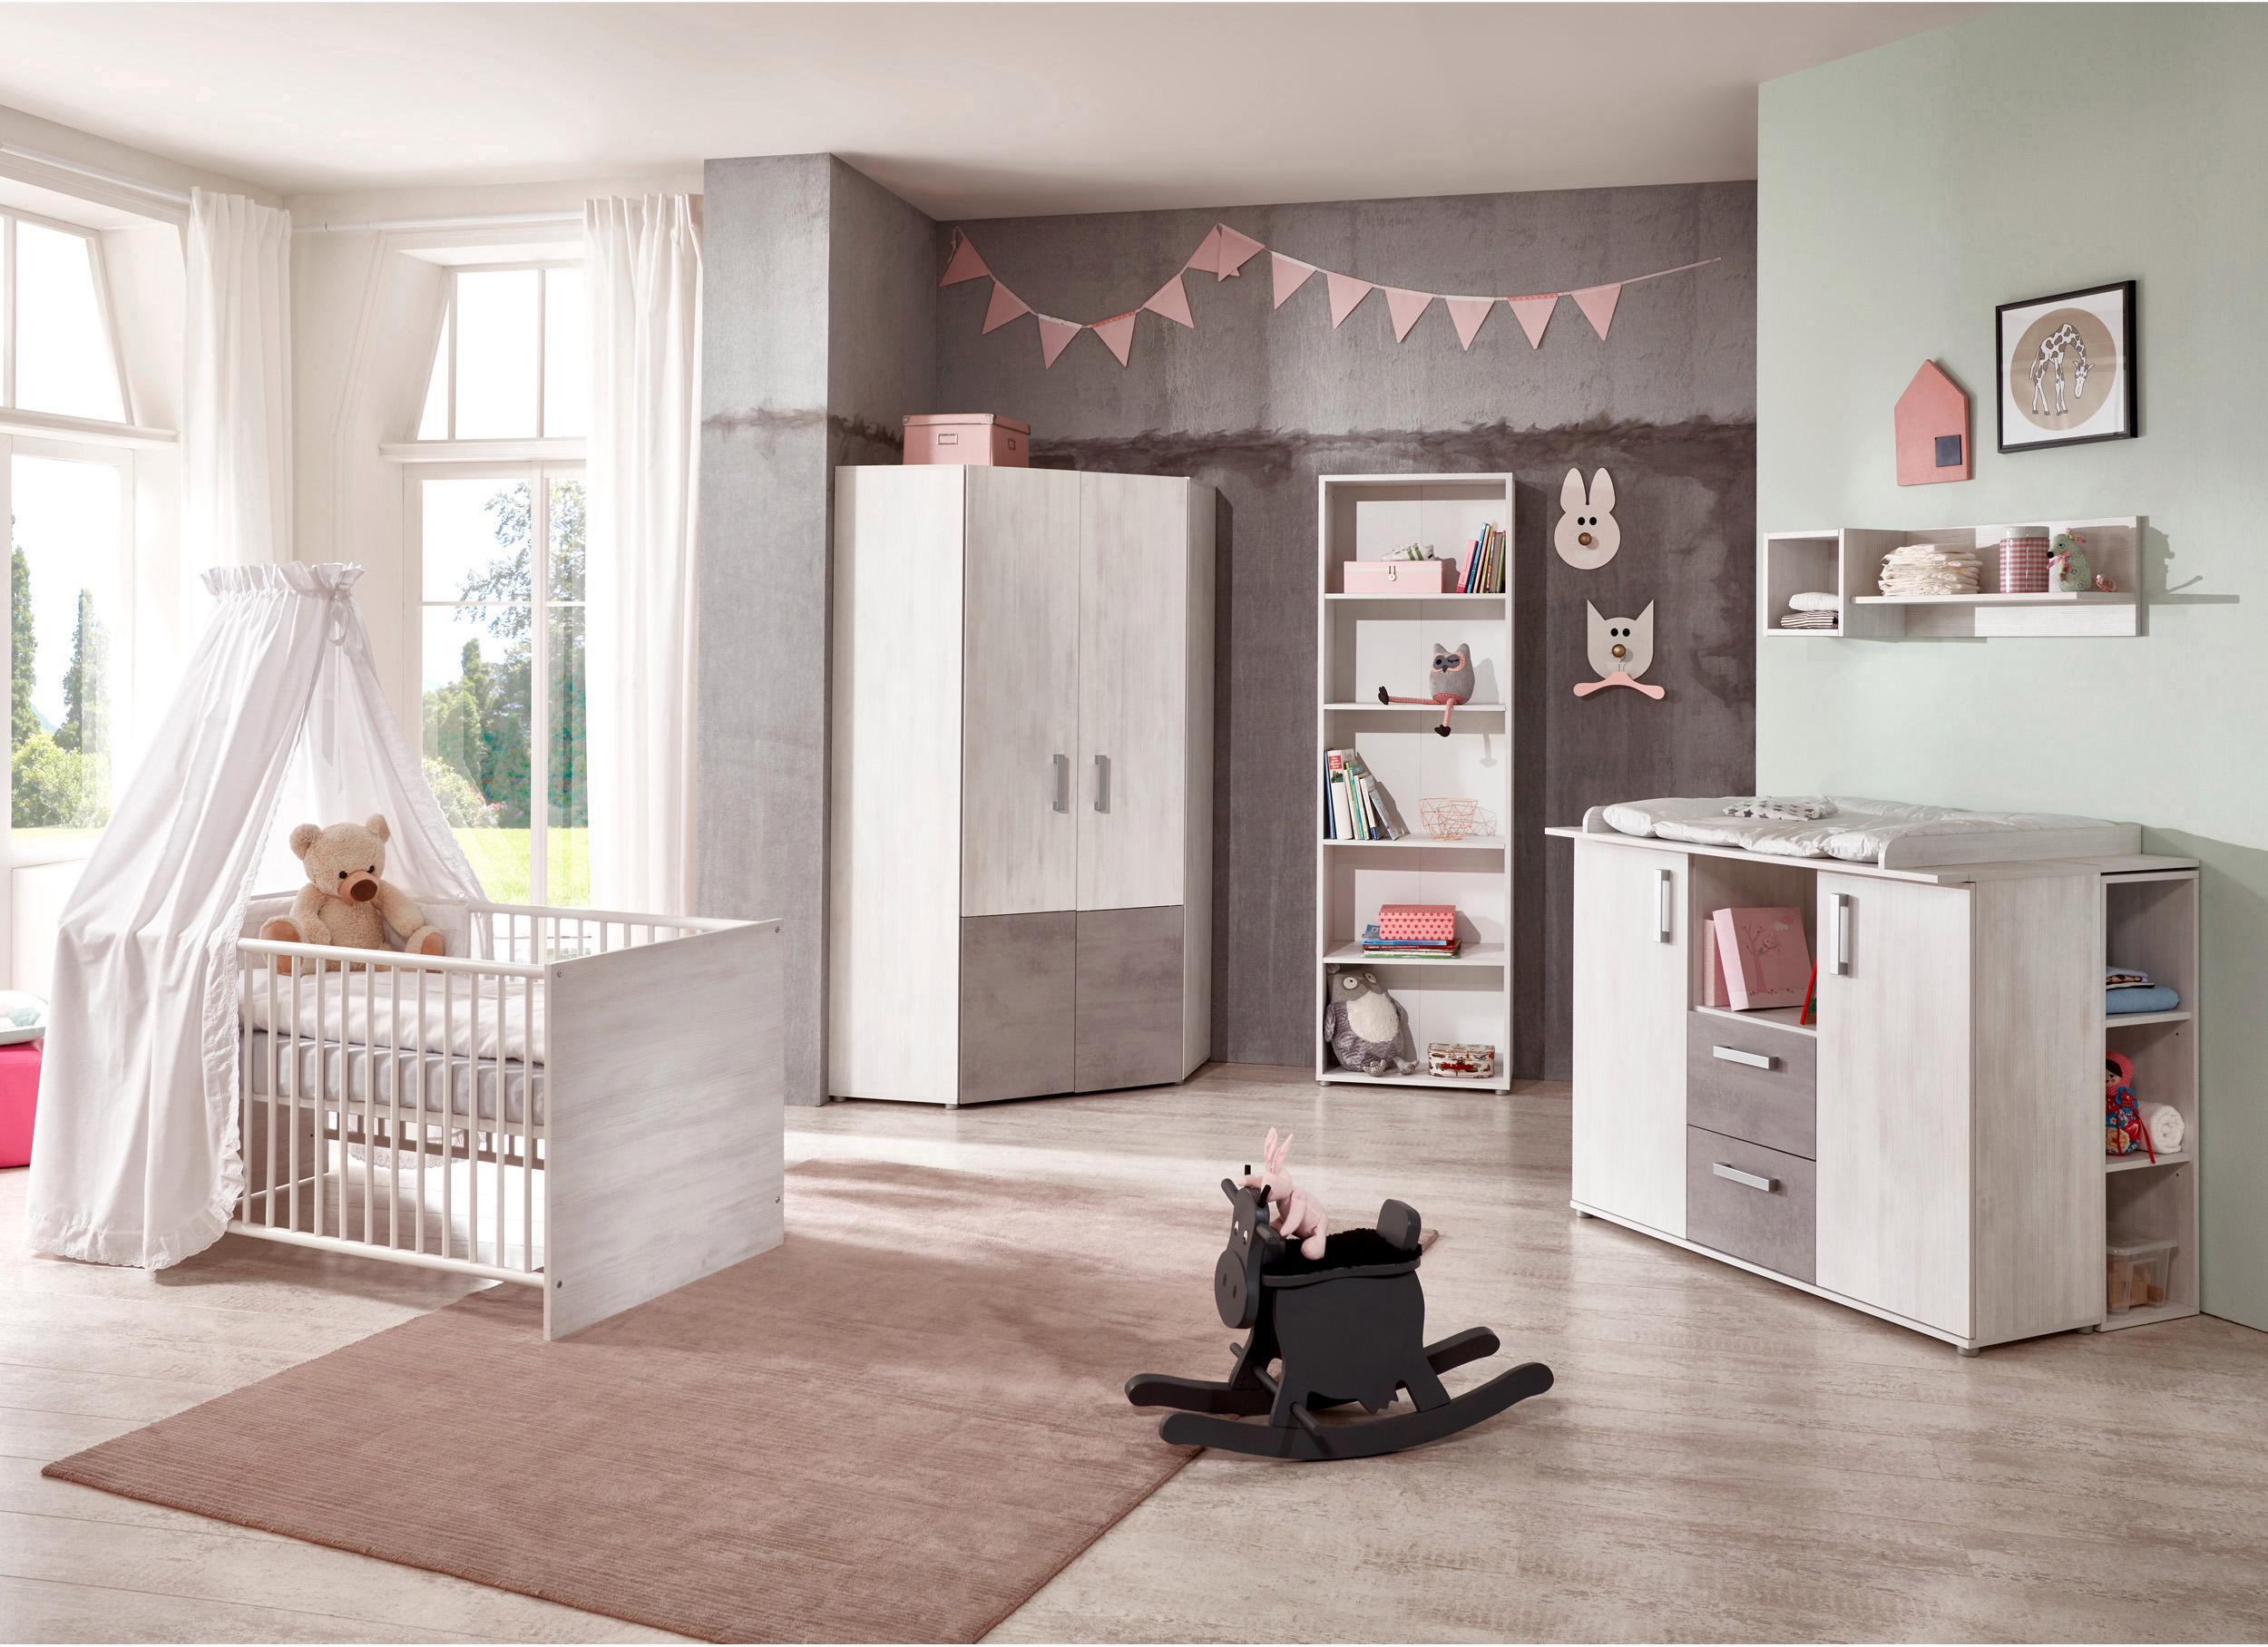 arthur berndt Babyzimmer-Komplettset Insa mit Eckkleiderschrank (Set 3-tlg)